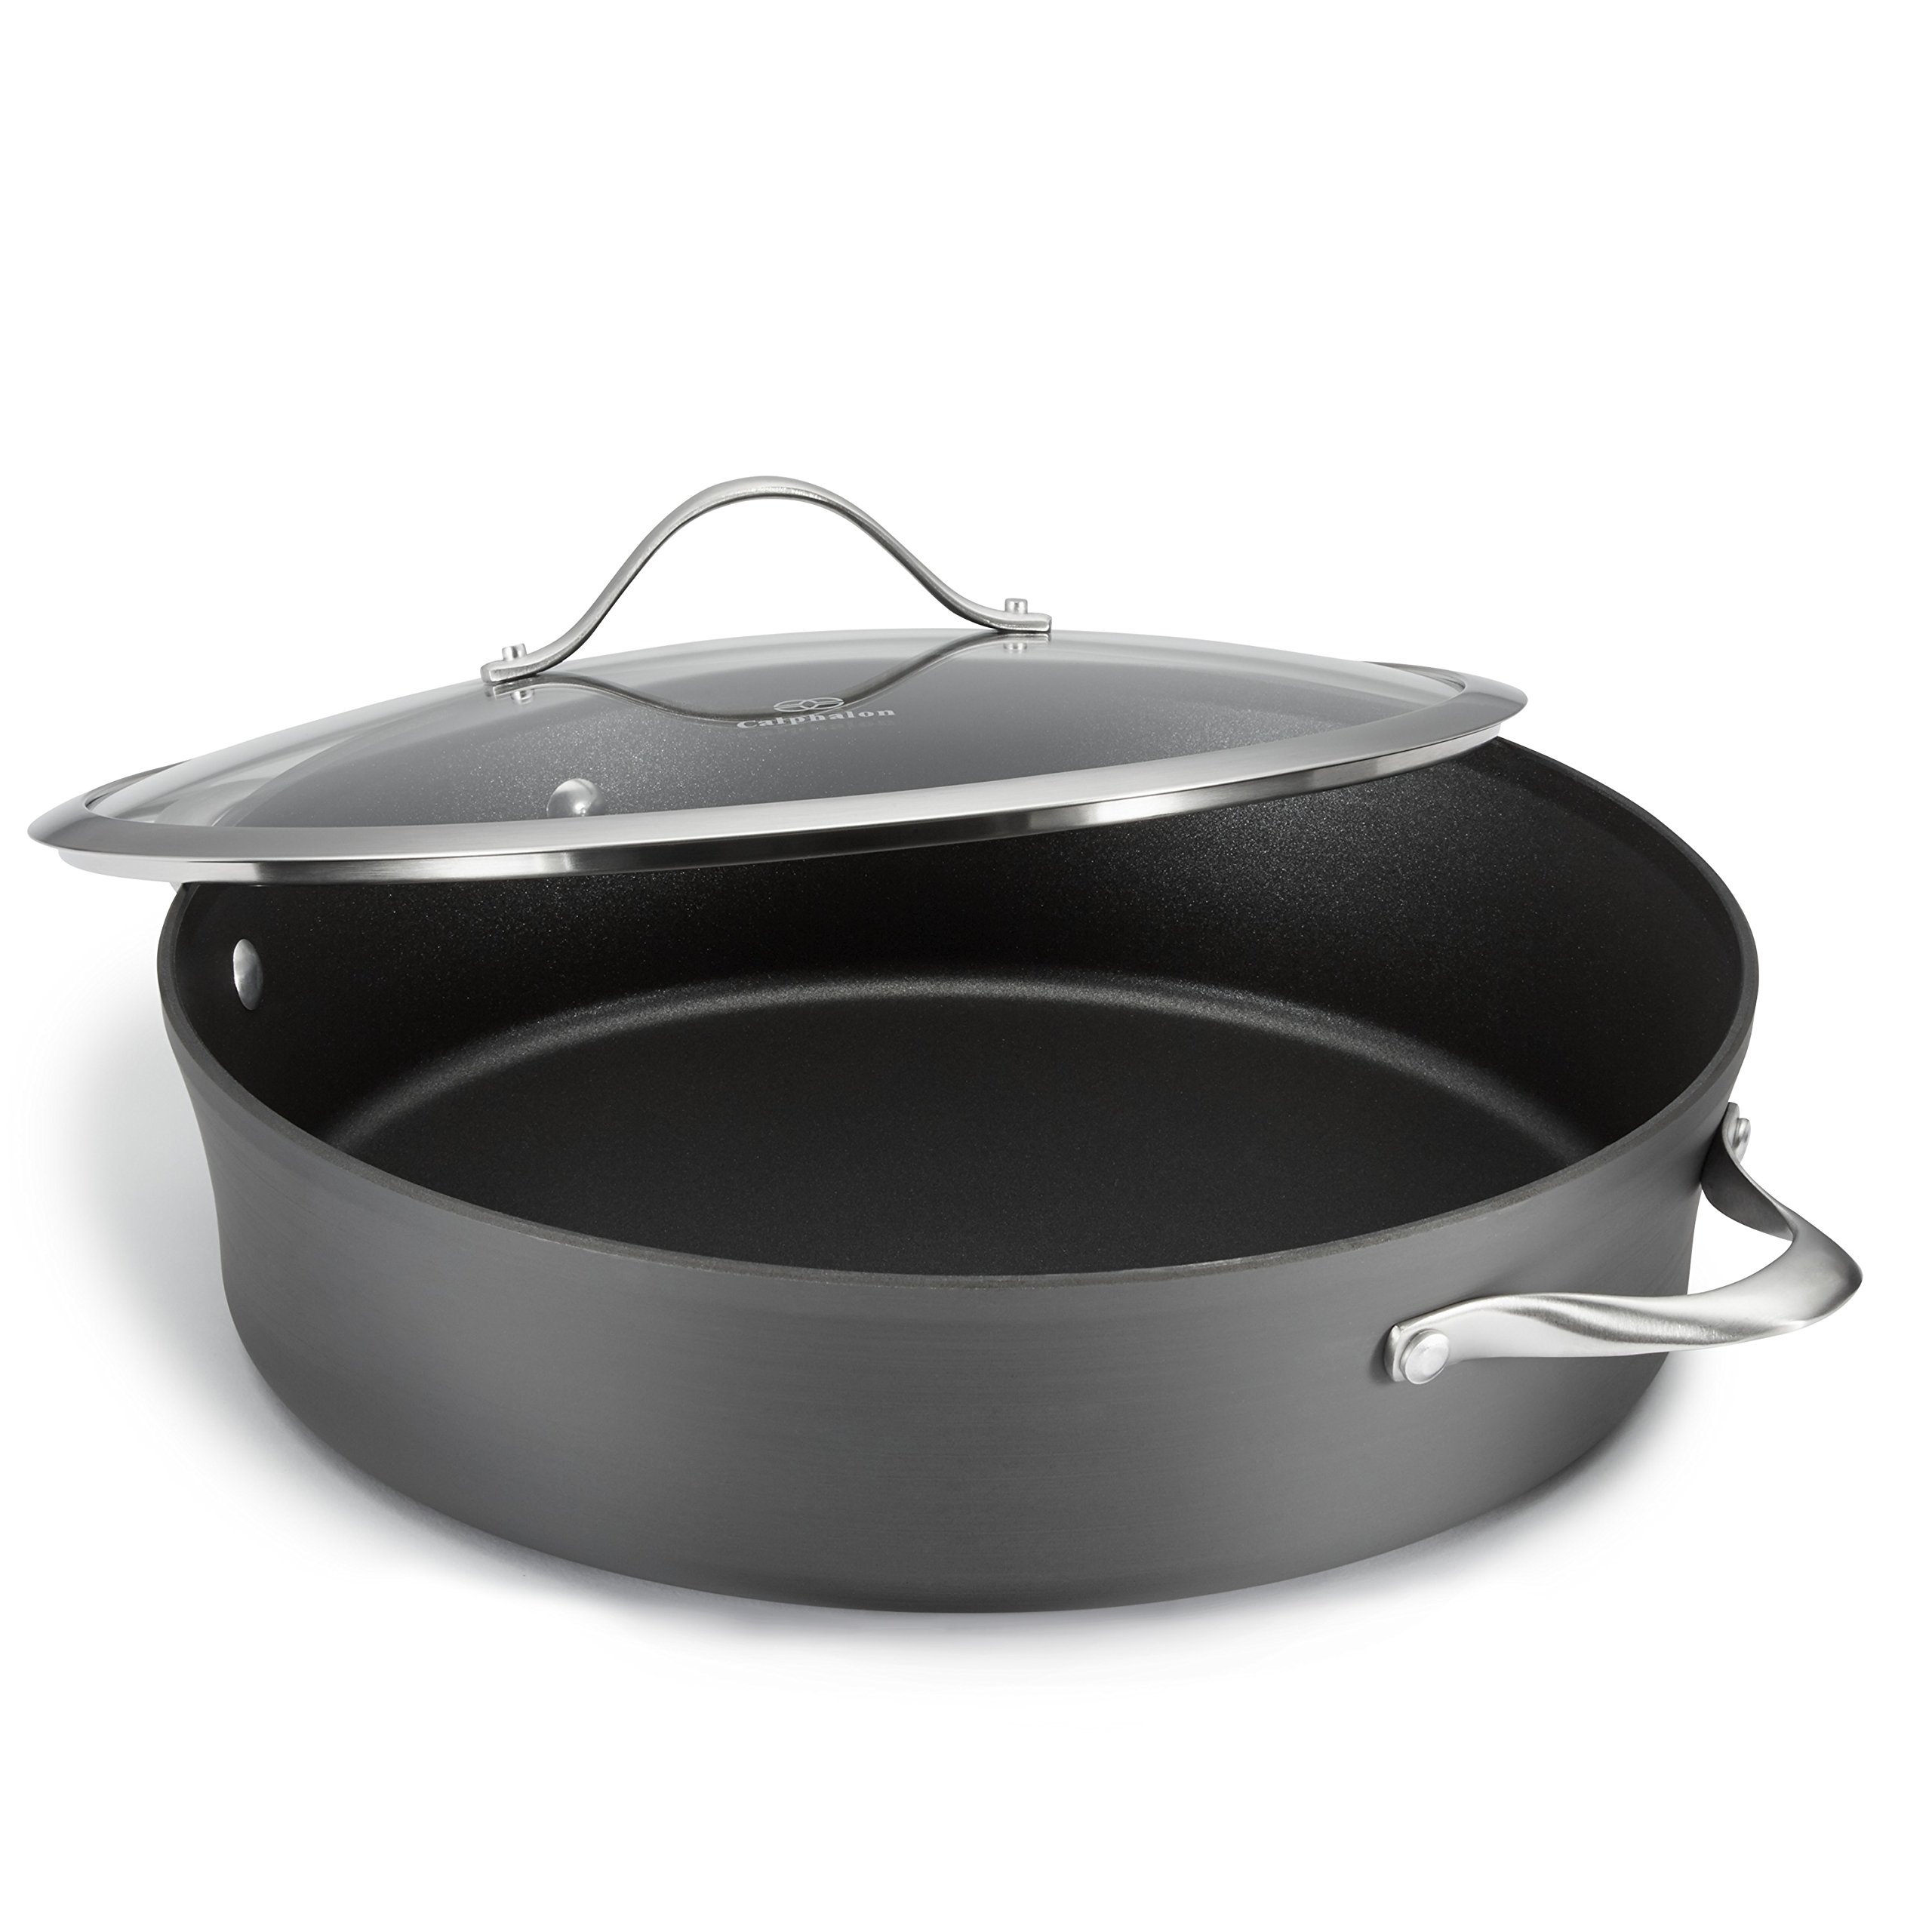 Calphalon Contemporary Hard-Anodized Aluminum Nonstick Cookware, Sauteuse Pan, 7-quart, Black by Calphalon (Image #2)